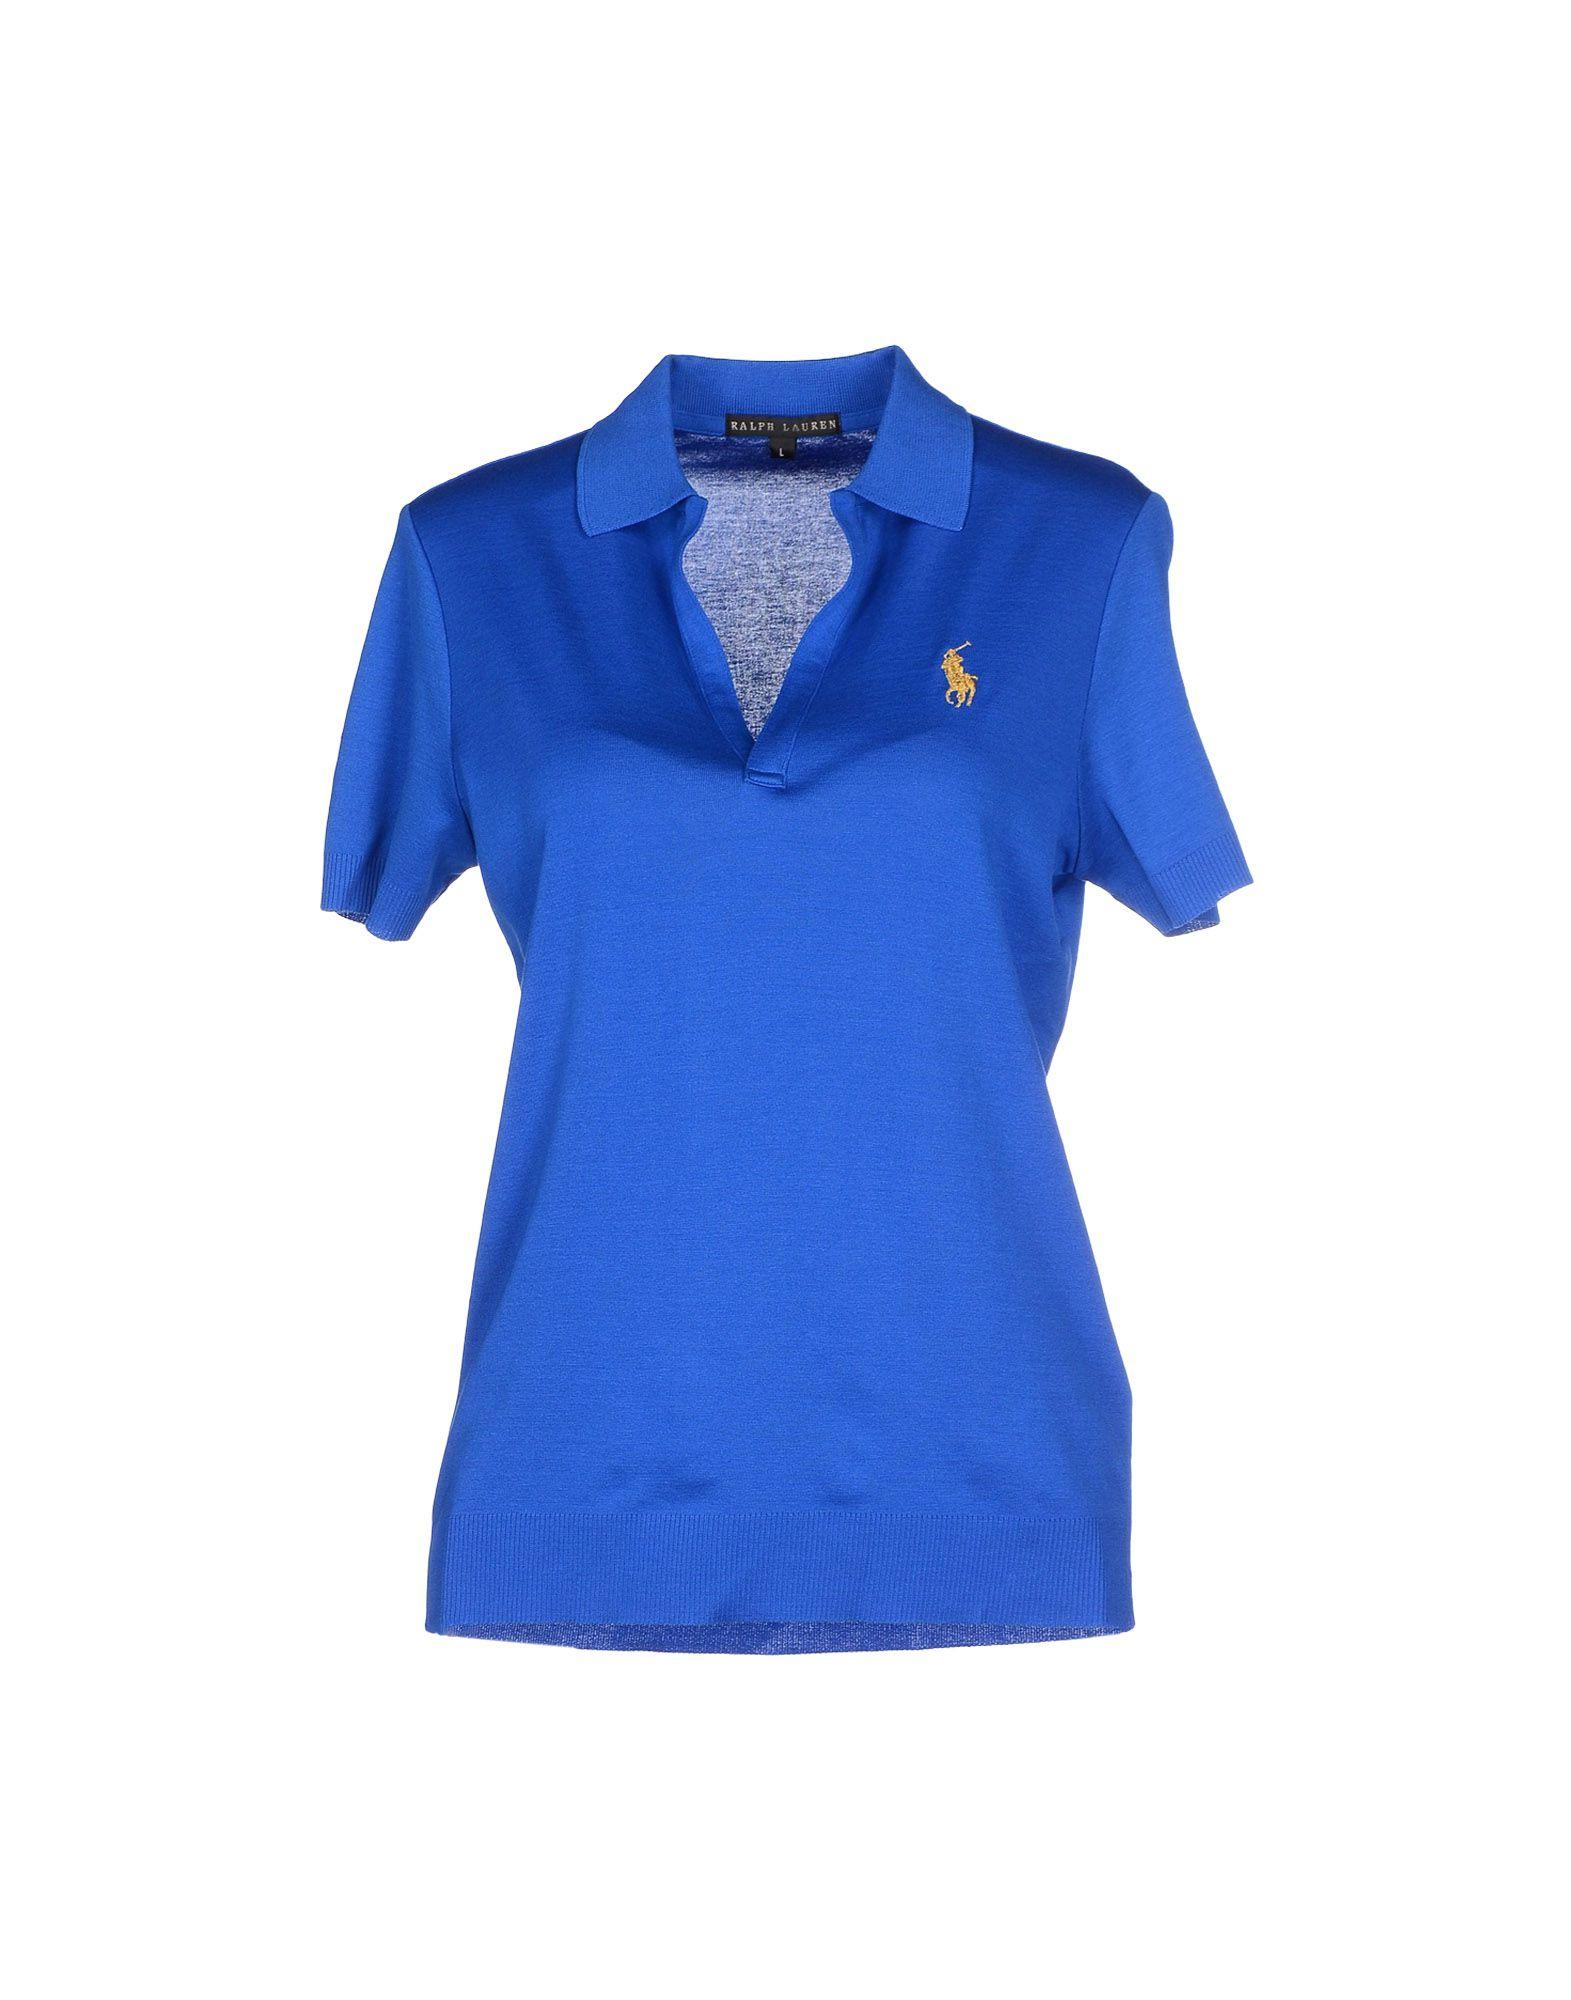 Ralph lauren black label polo shirt in blue lyst for Ralph lauren black label polo shirt